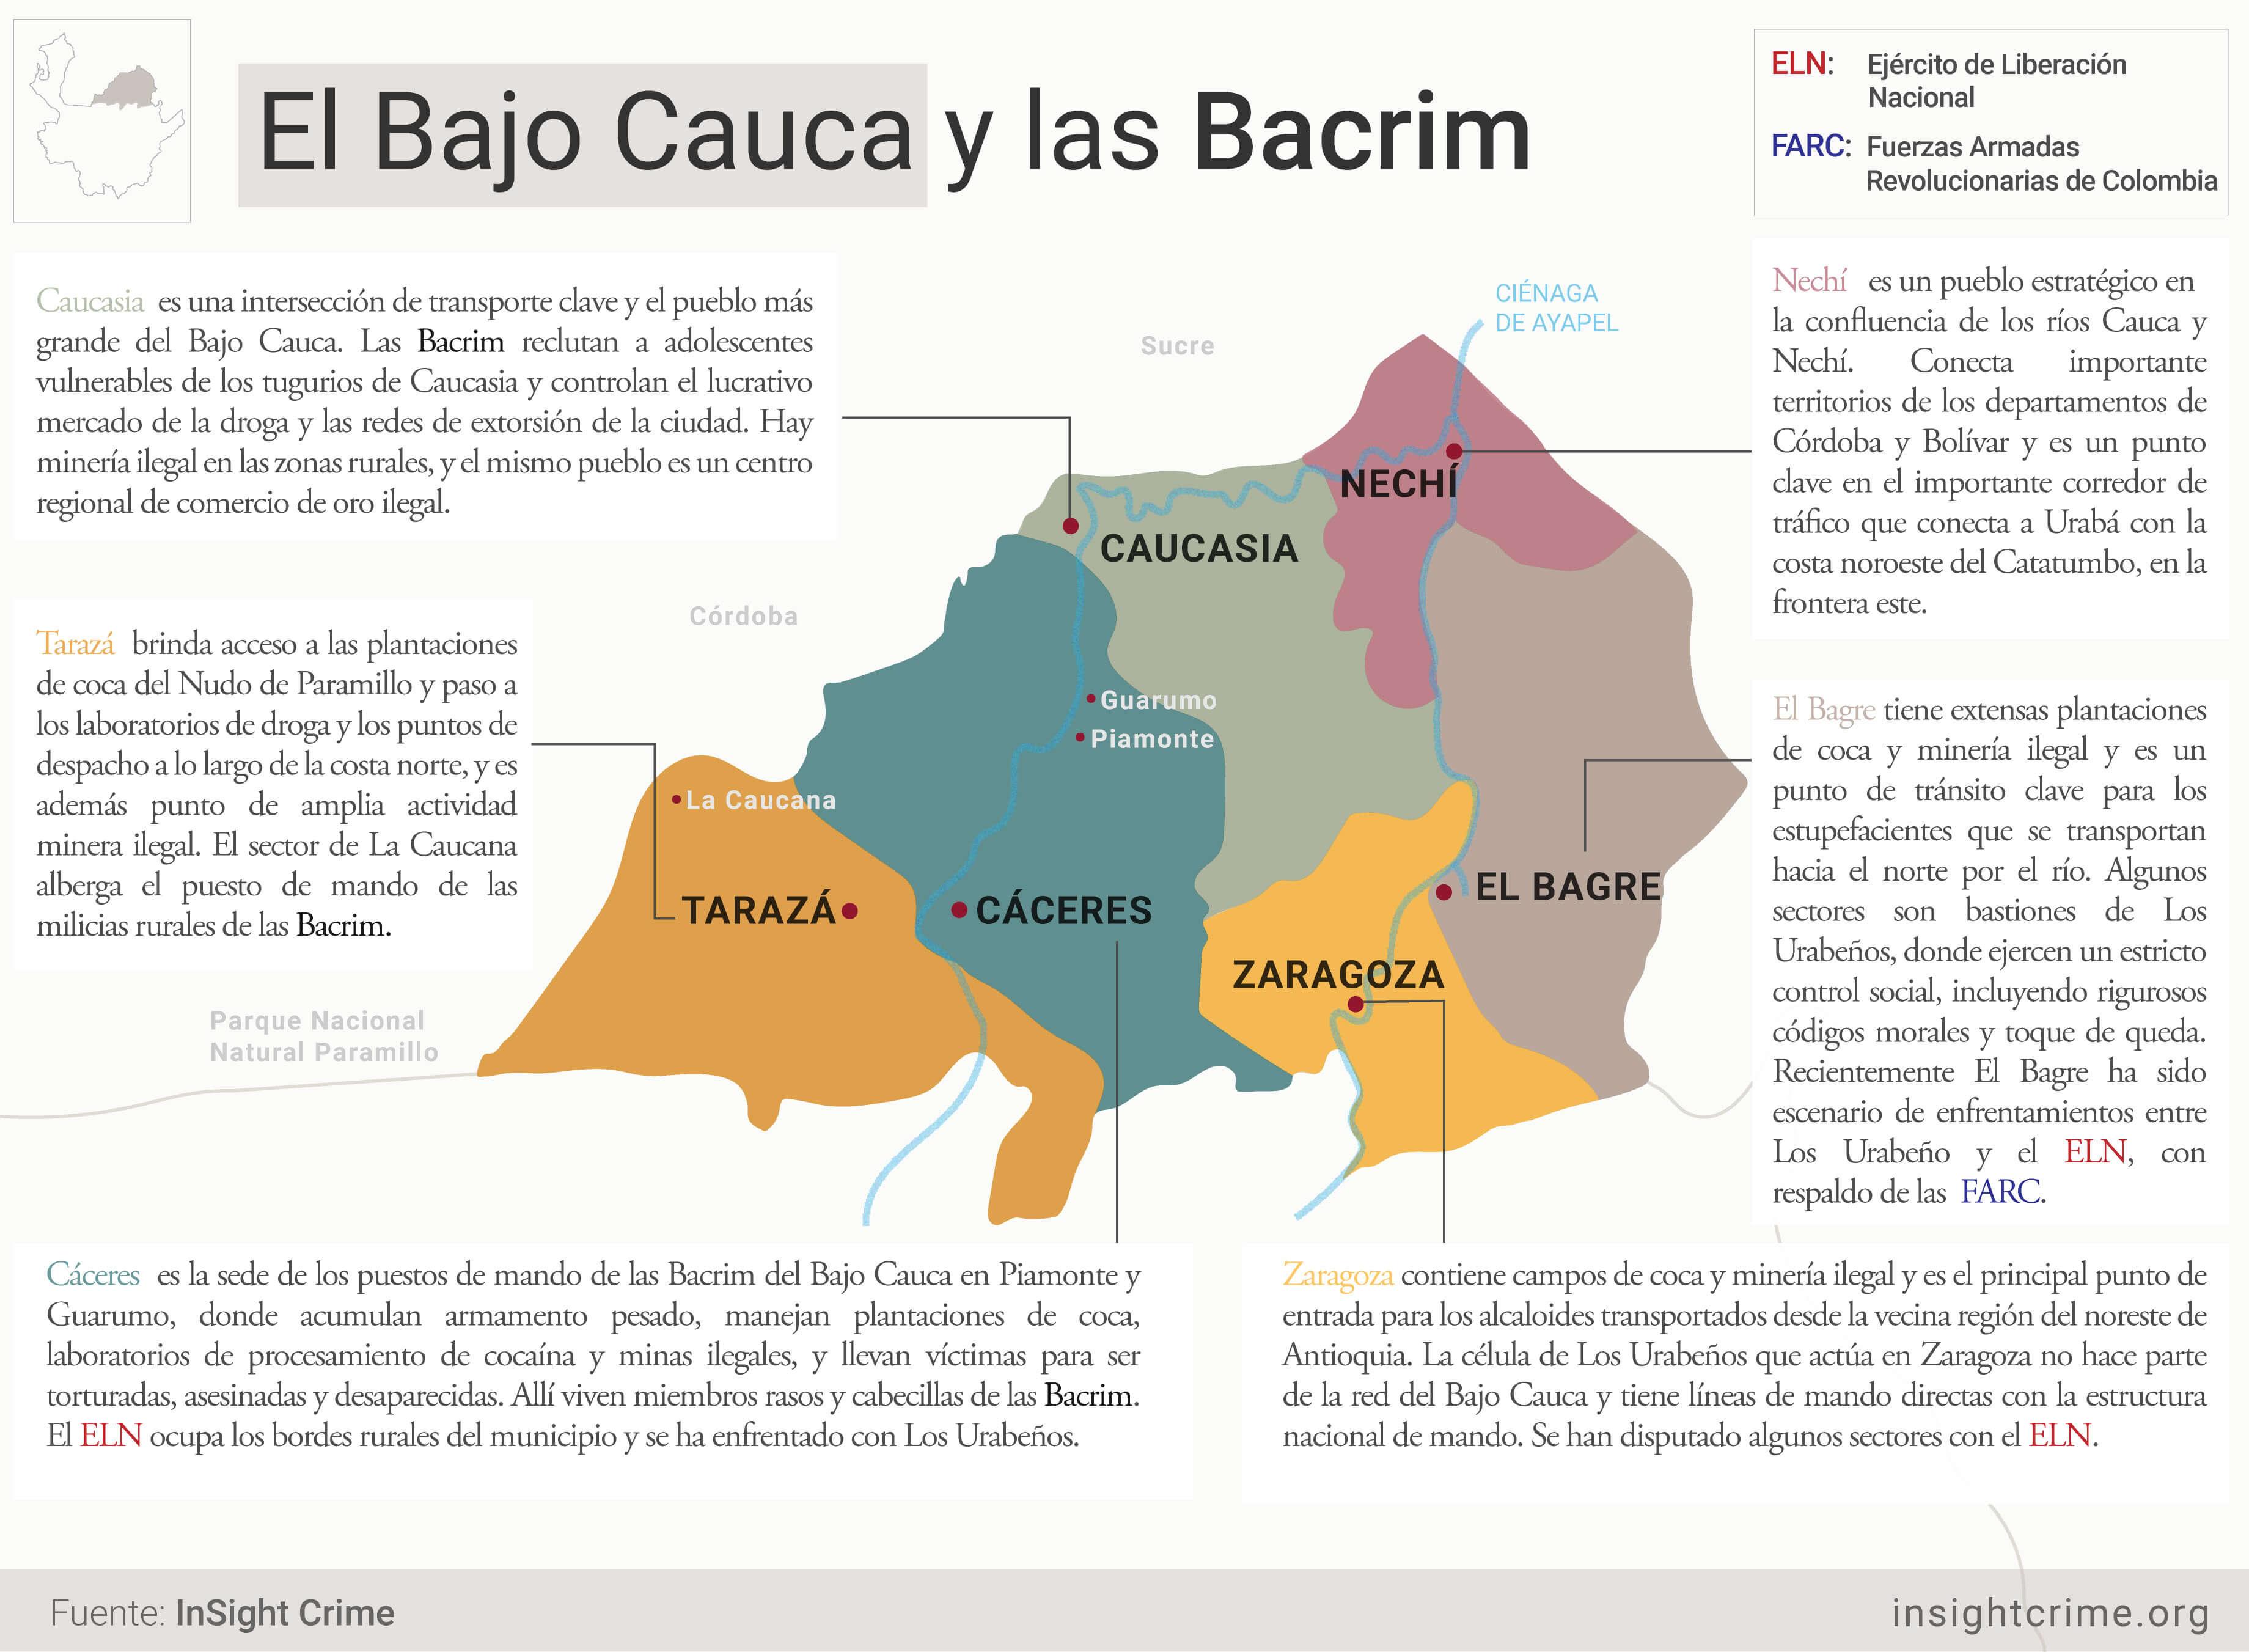 BACRIM BAJO CAUCA MAP